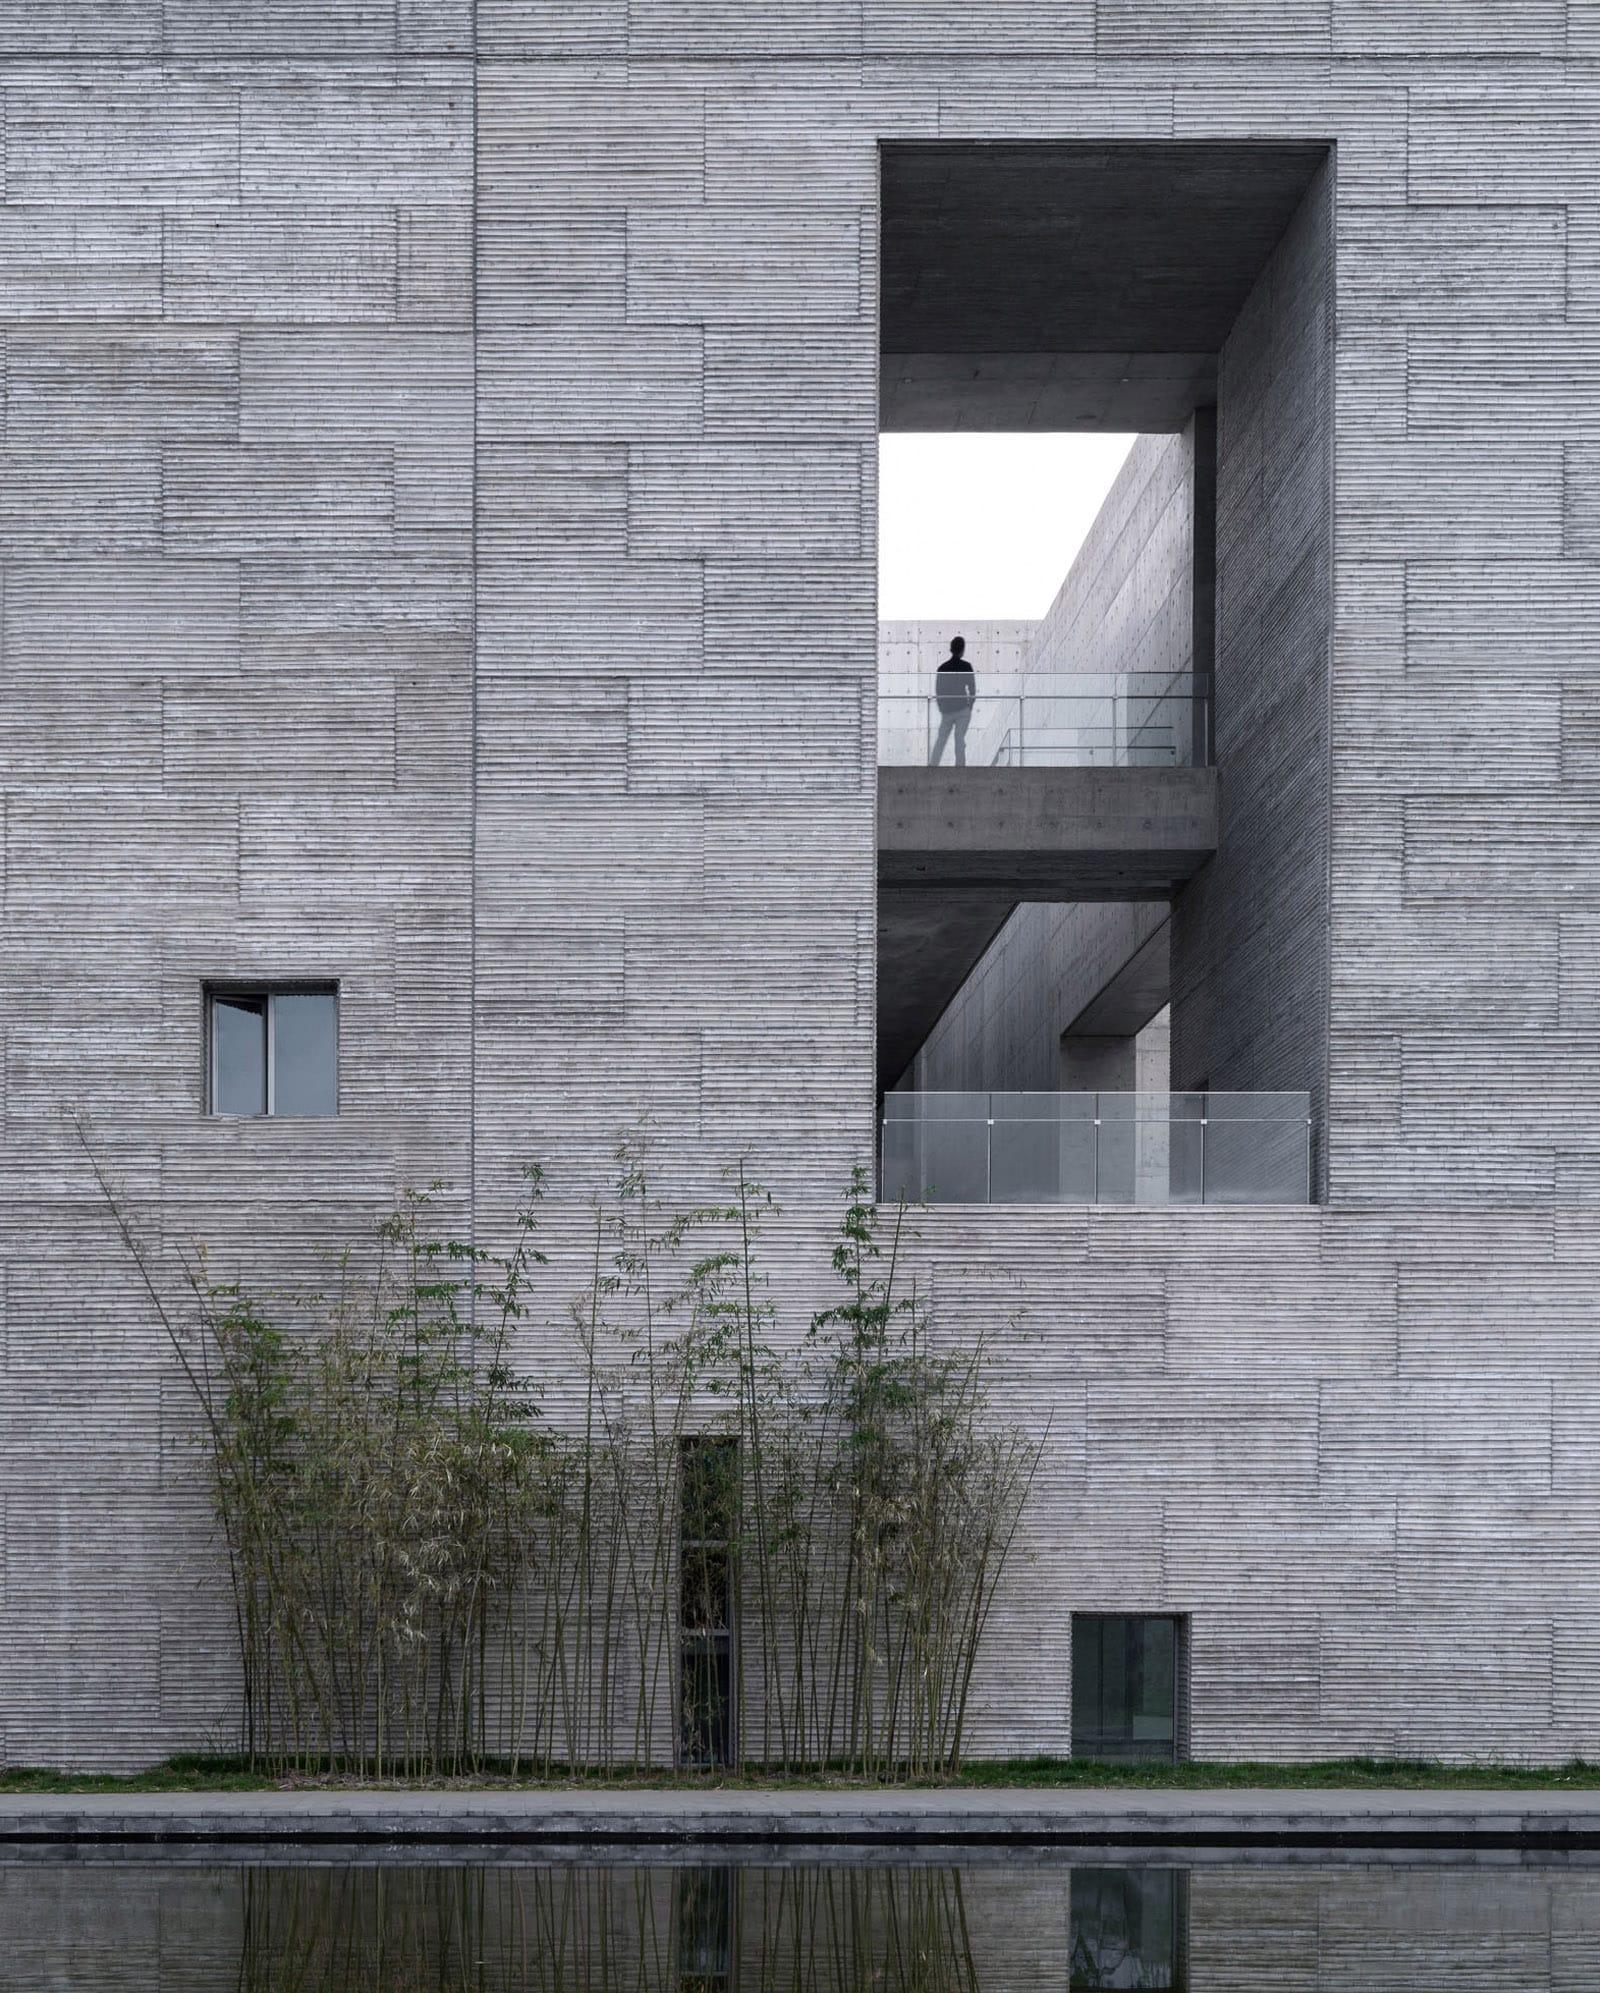 Shou County Culture and Art Center  - 20210702 Zhu Pei ShouCountyCultureArtCenter 05 1 39